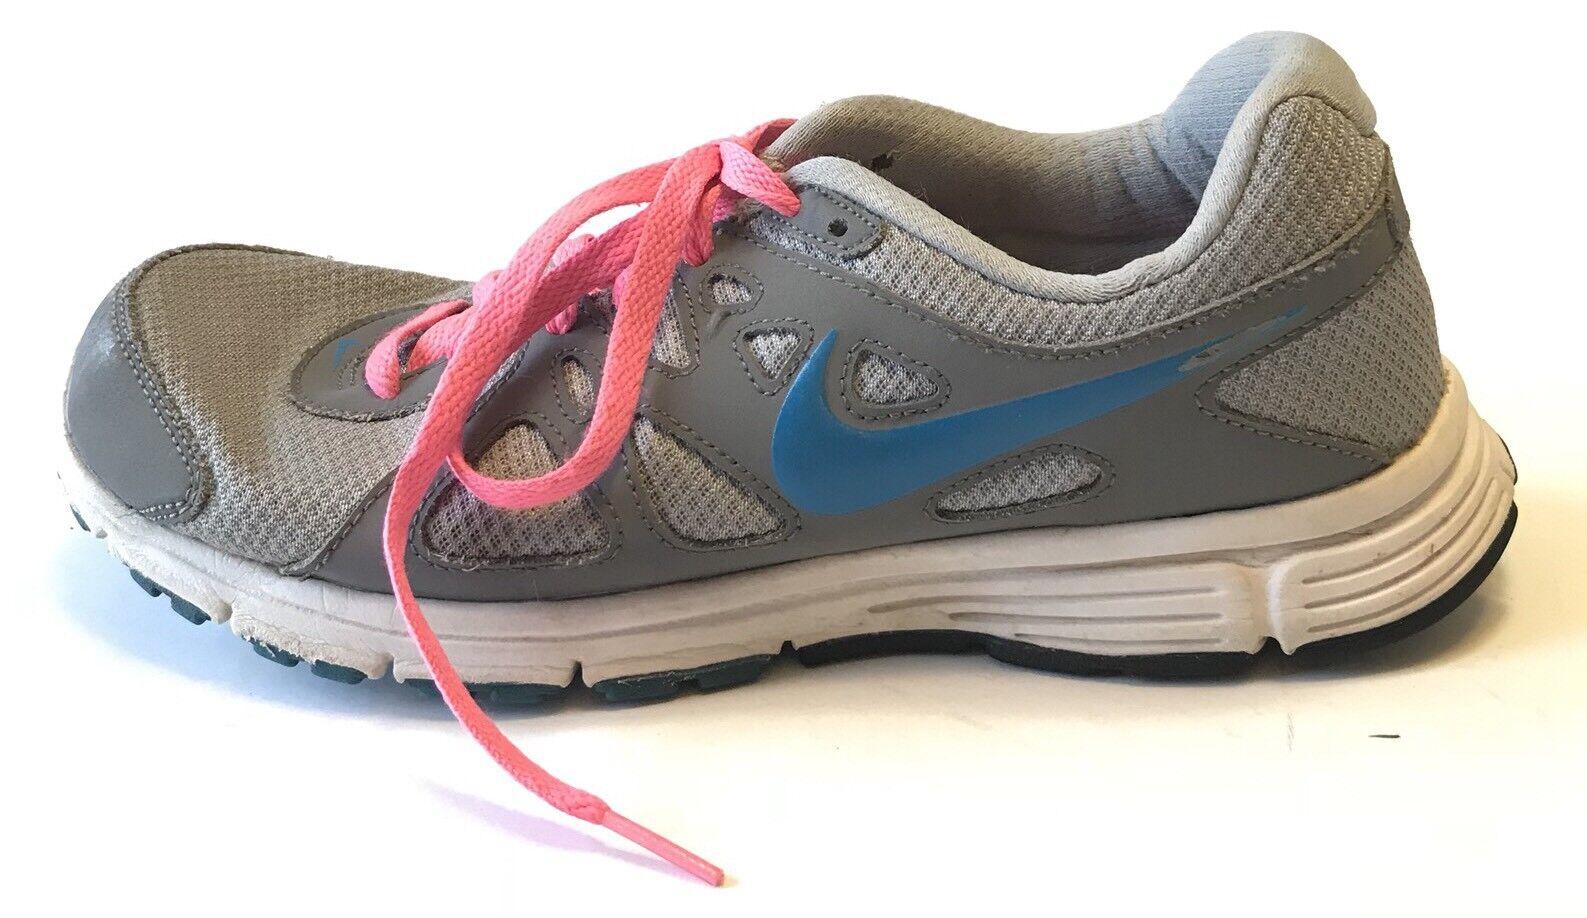 new style 13625 b93bf ... Nike Revolution 2 Sneakers Size 9 Gray Pink Running Shoe Shoe Shoe  0c28da ...